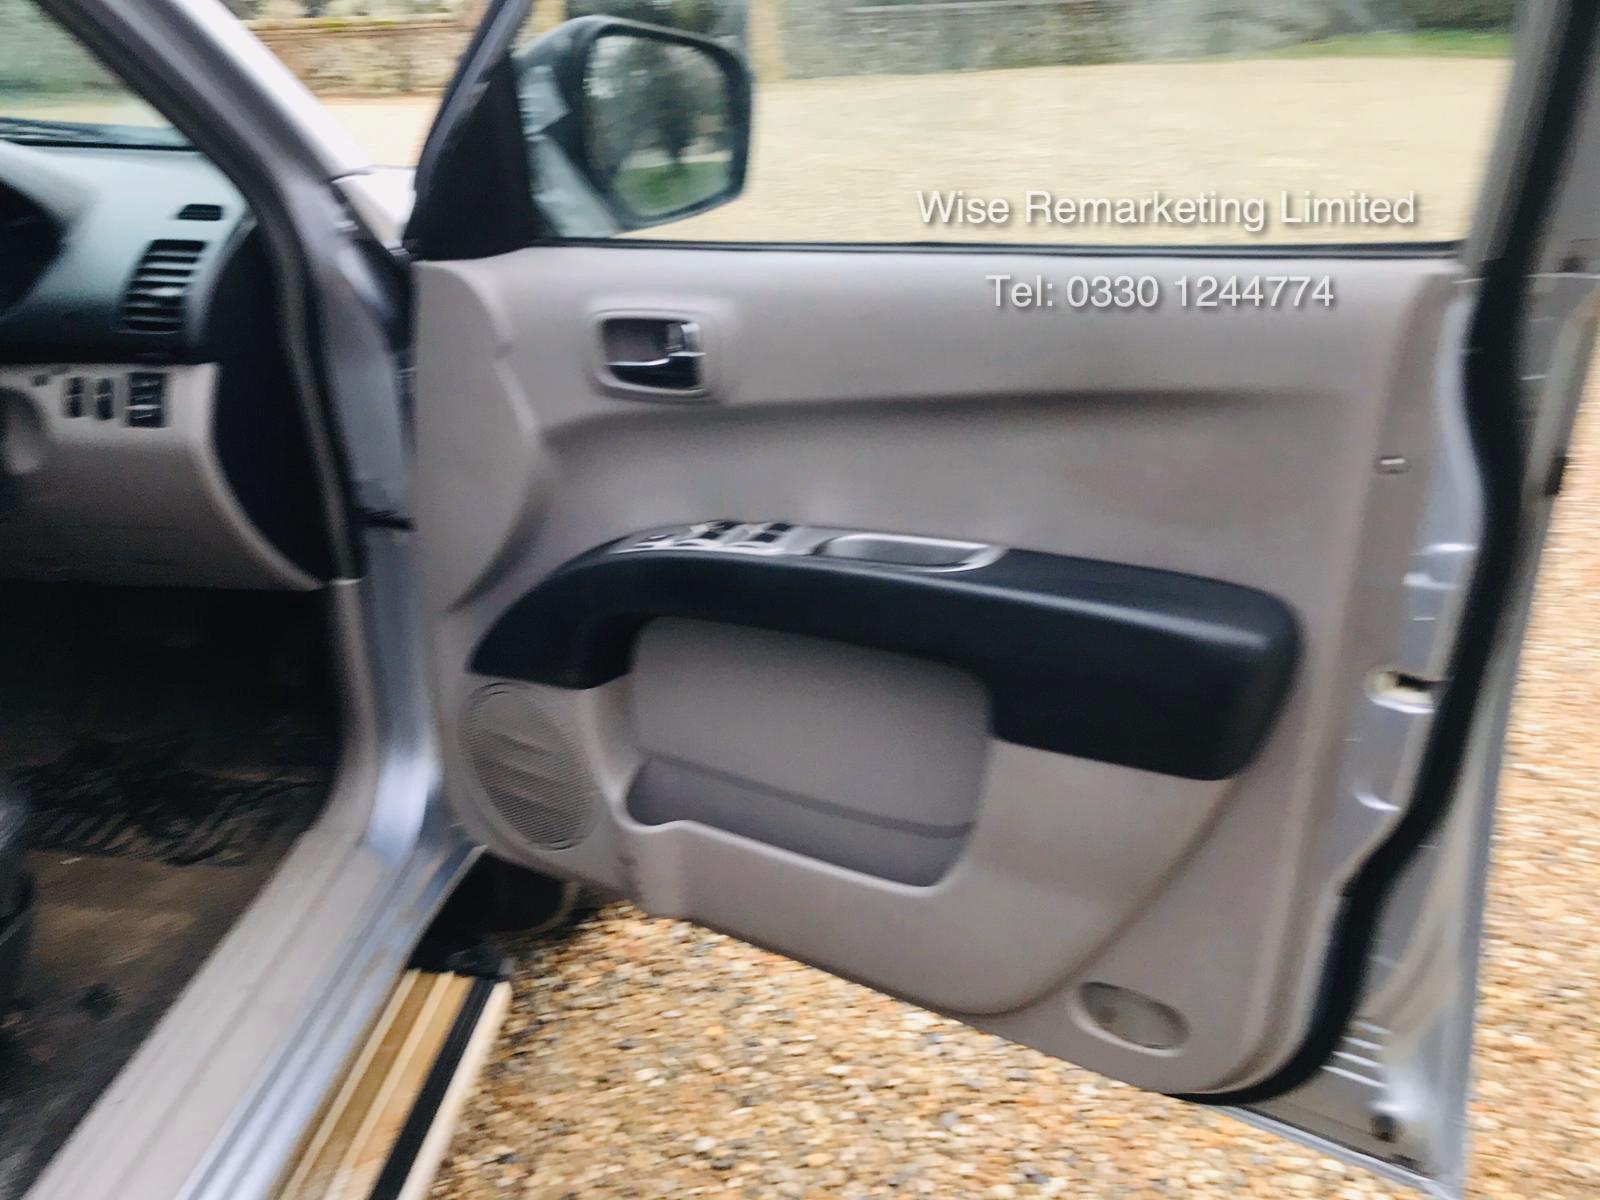 Mitsubishi L200 2.5 DI-D Warrior Auto - 2008 08 Reg - Full Leather - SAVE 20% NO VAT - Image 15 of 26